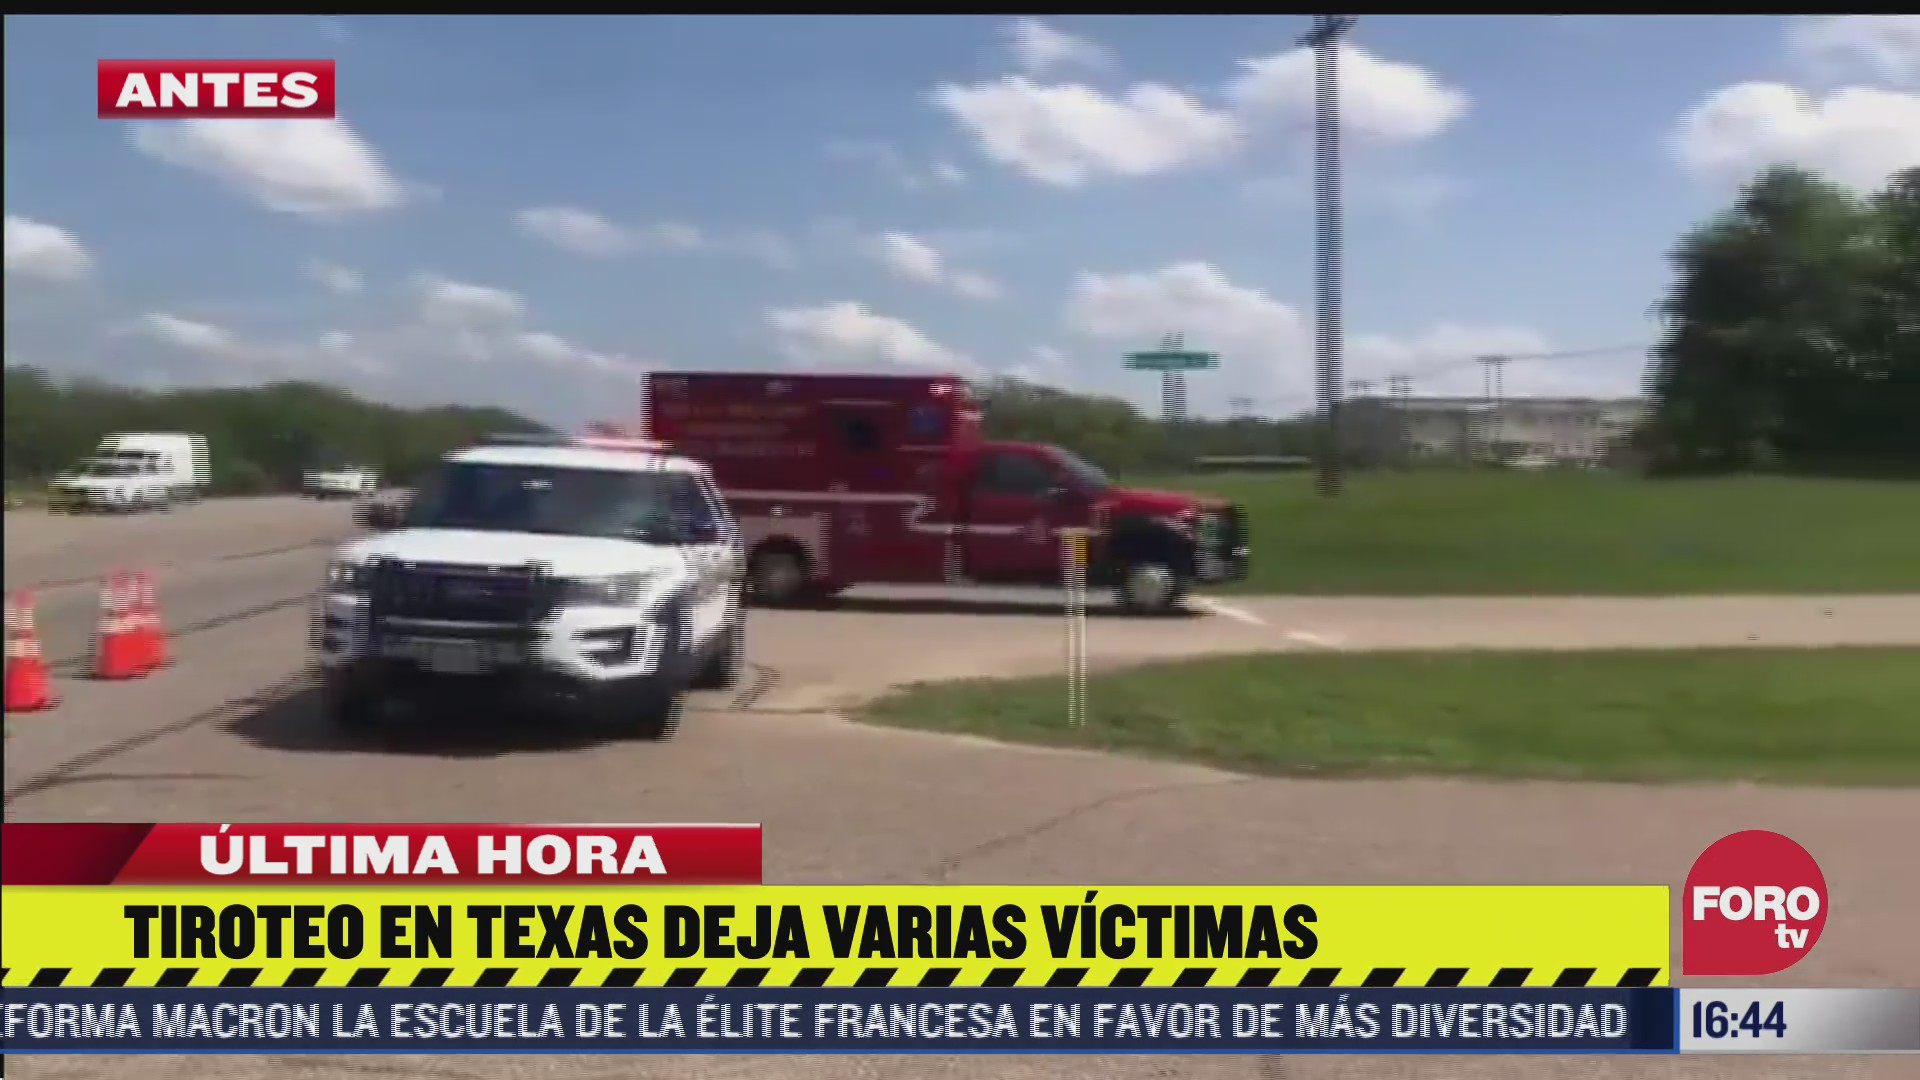 tiroteo en texas deja varias victimas